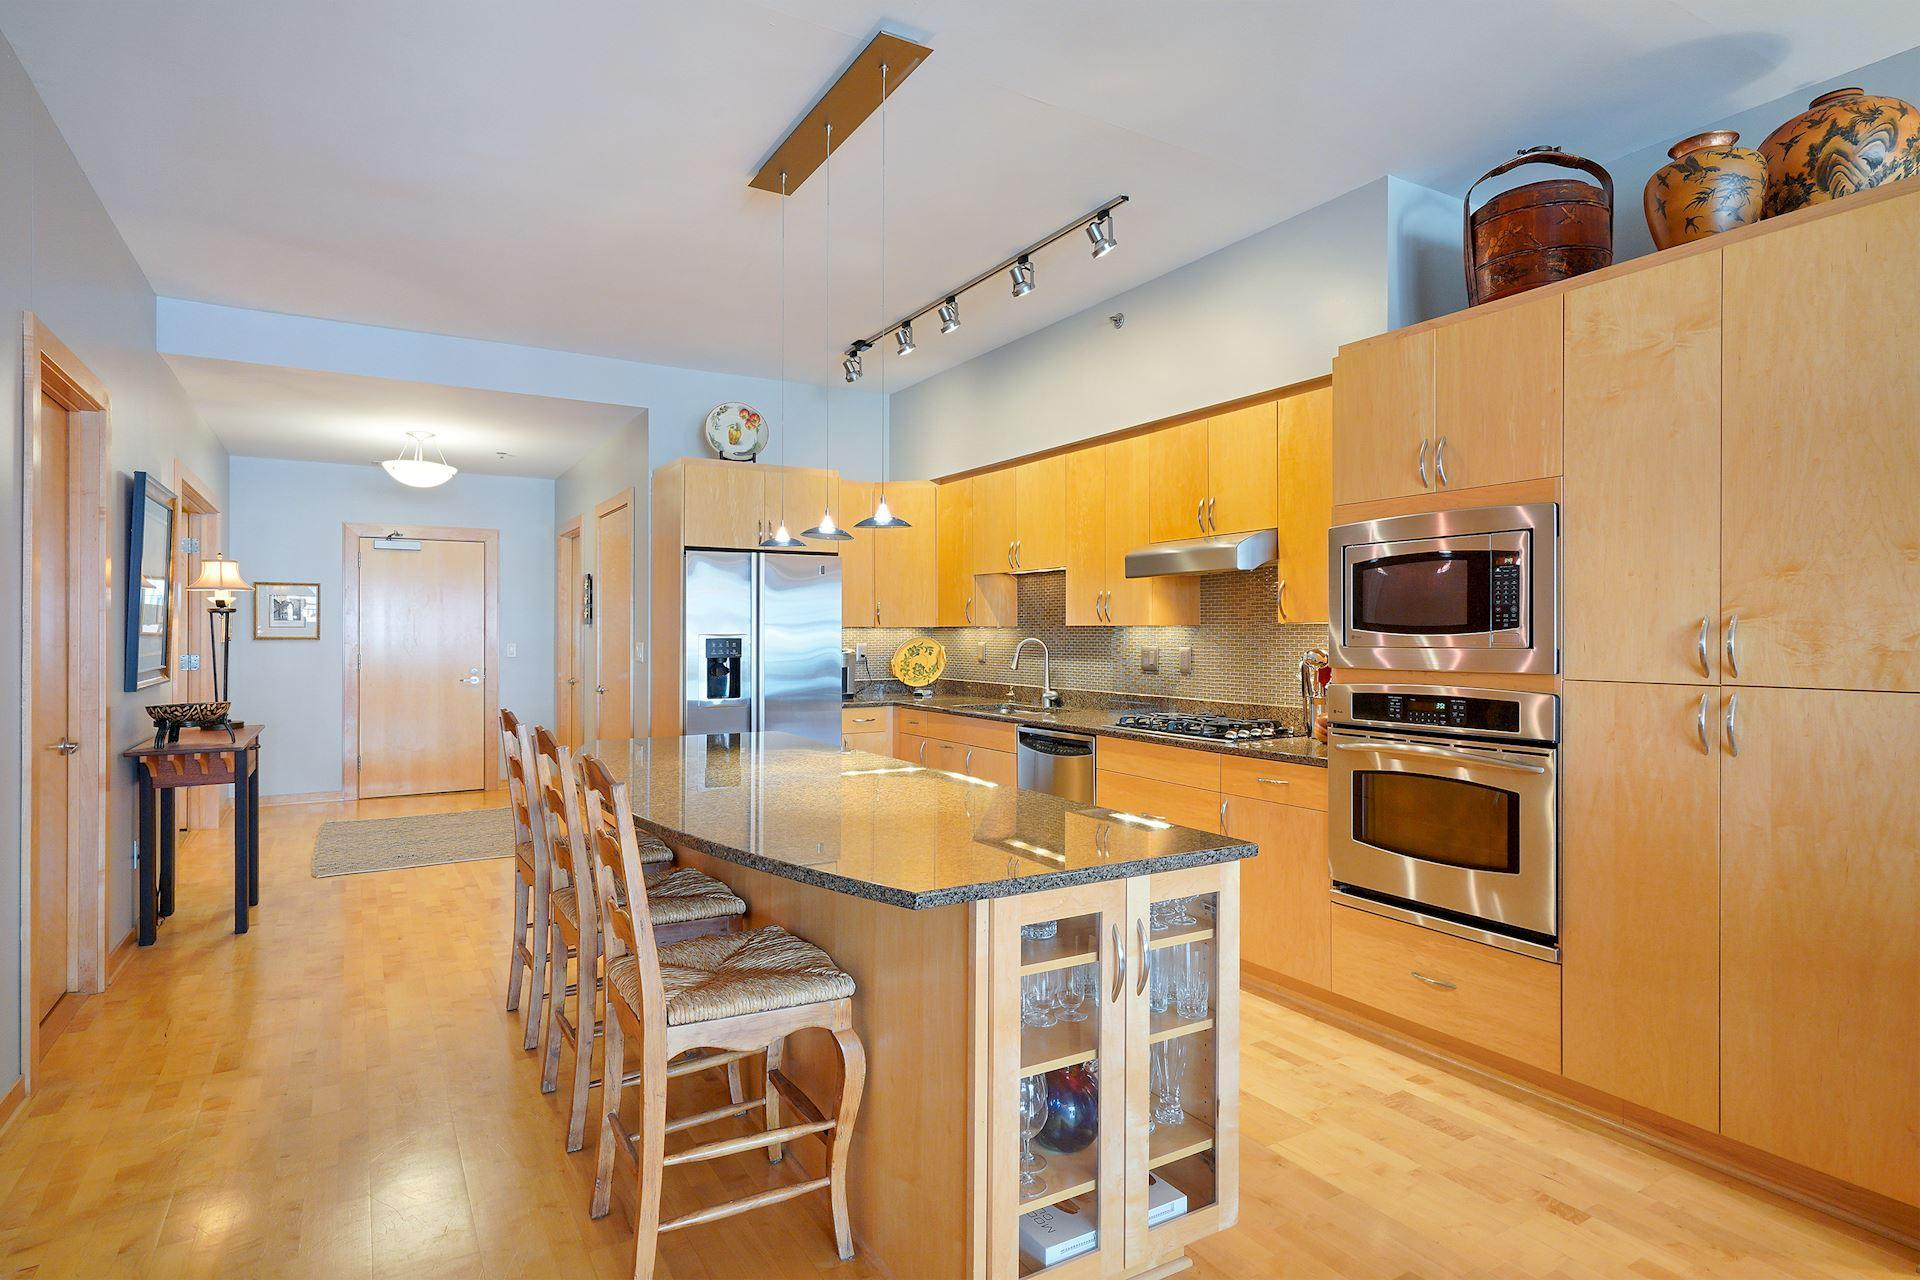 401 N 2nd Street #406 Property Photo - Minneapolis, MN real estate listing